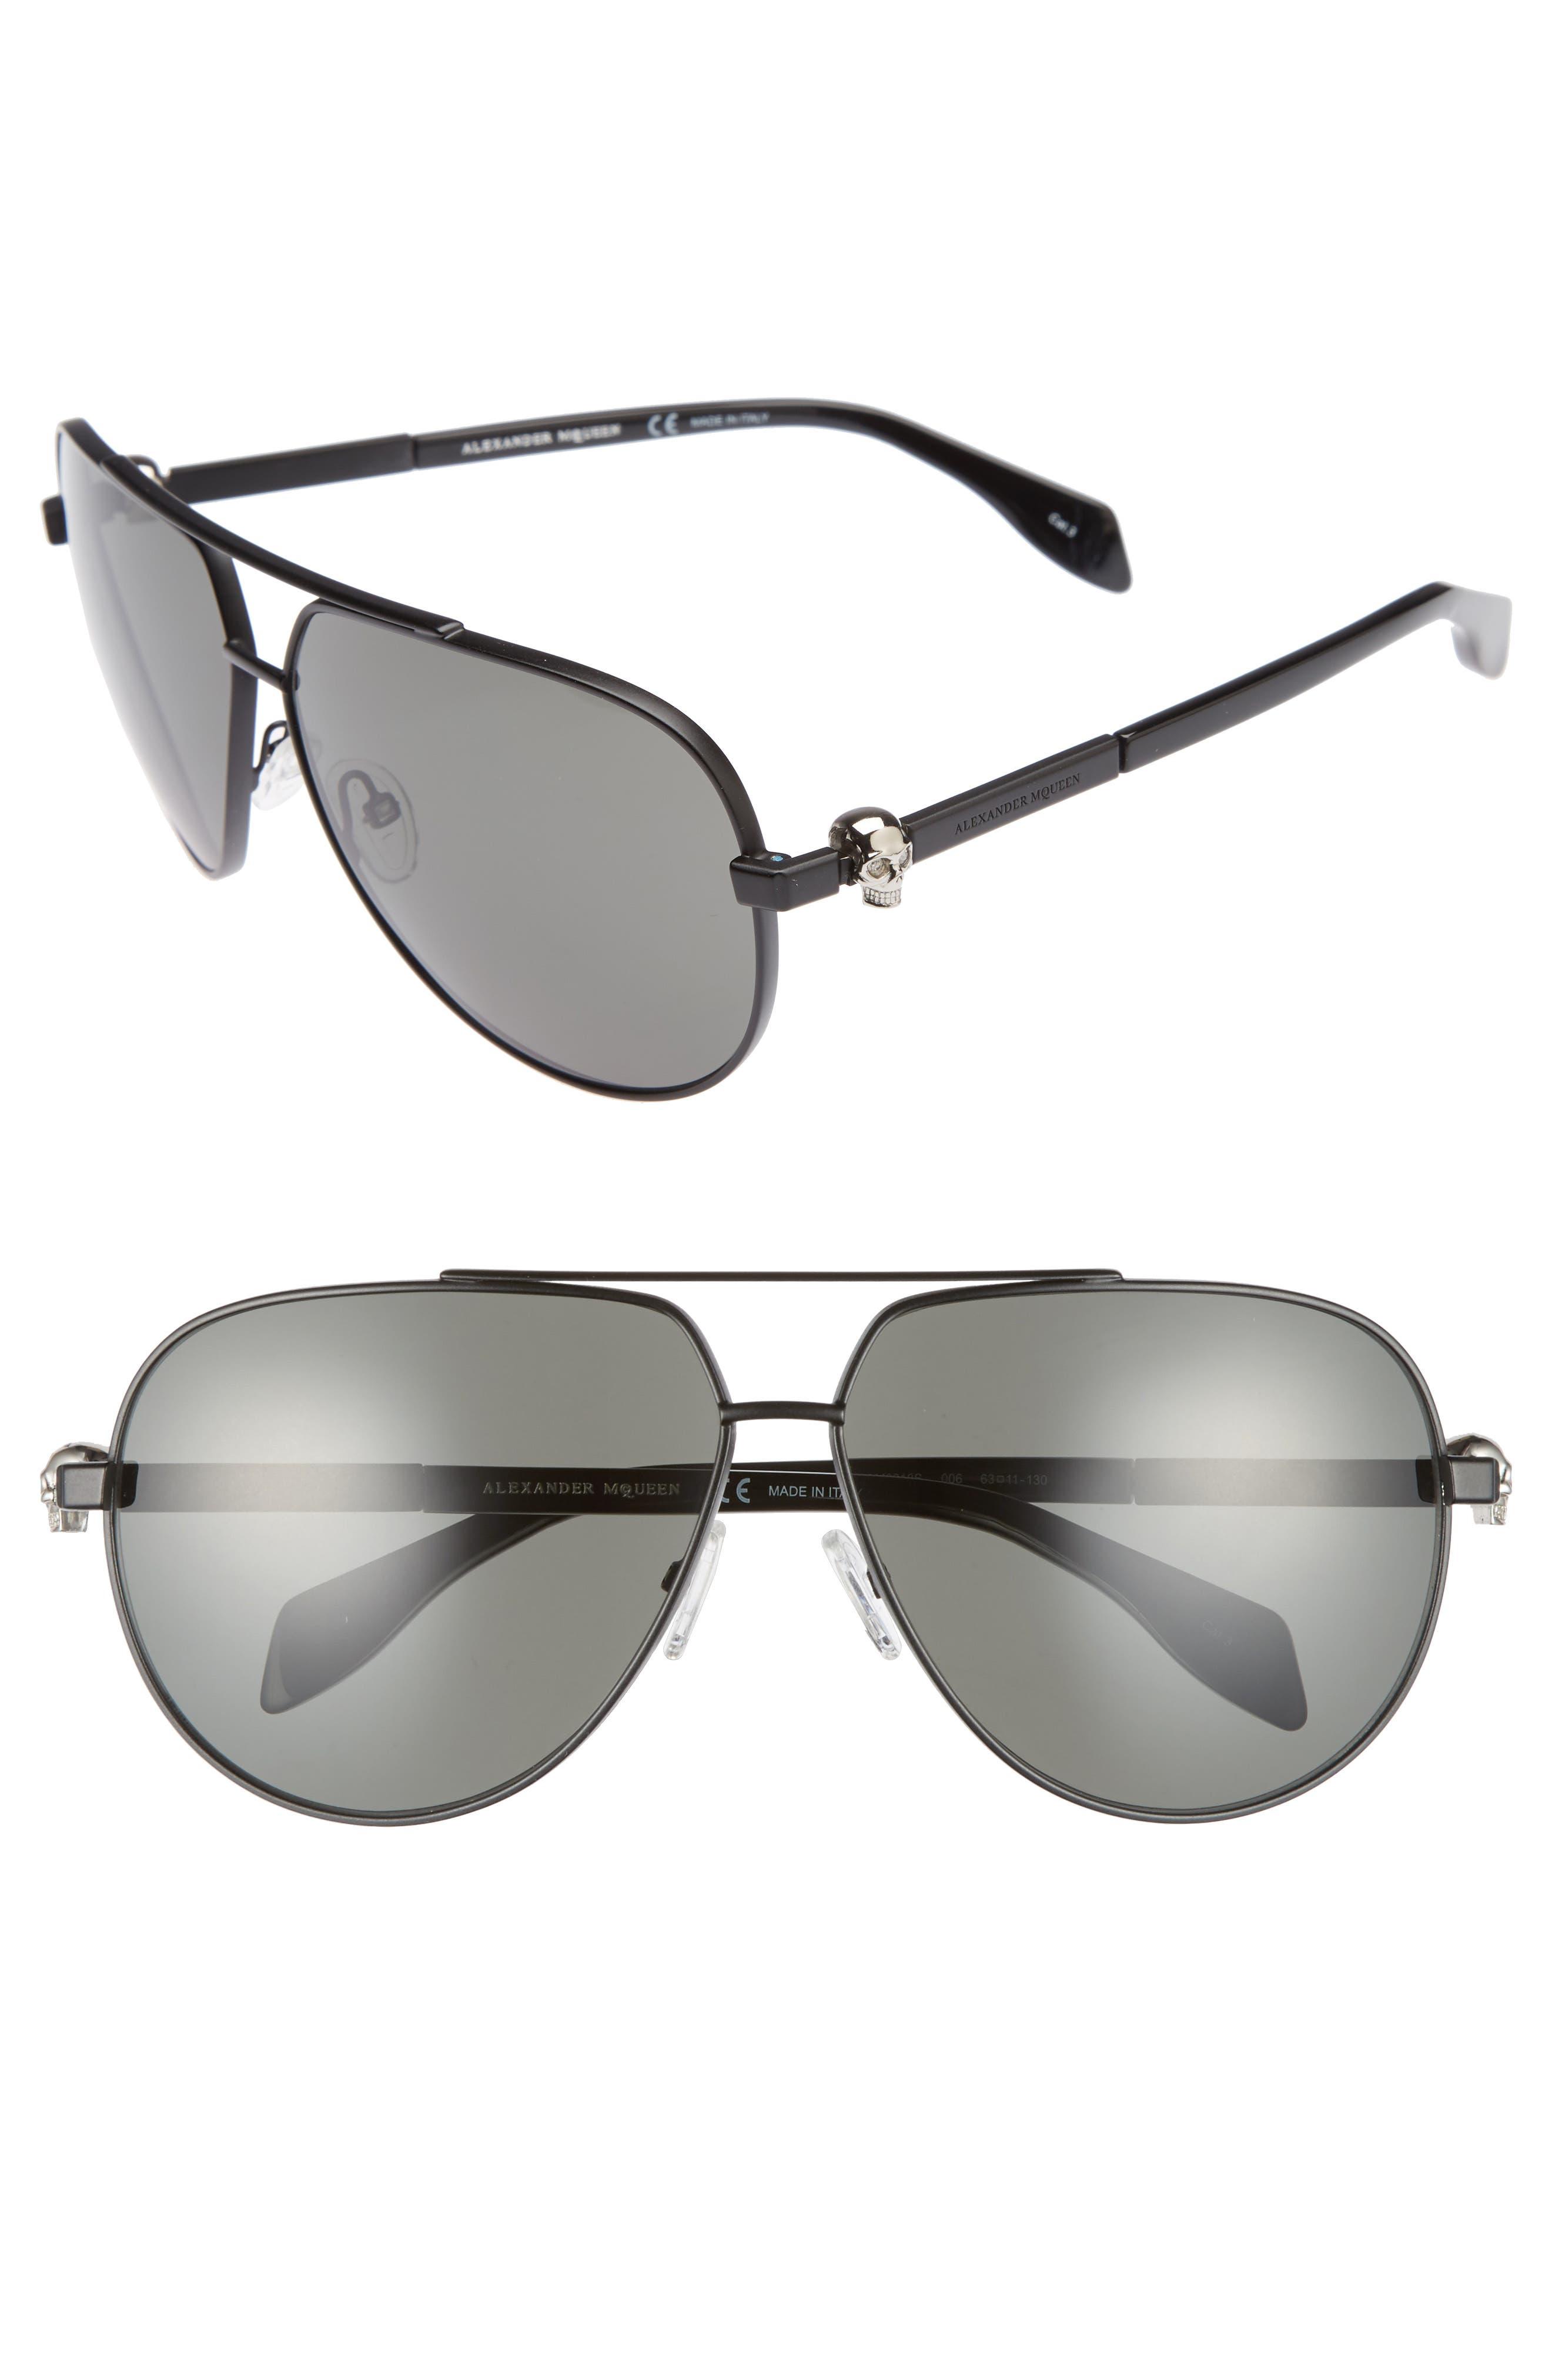 63mm Aviator Sunglasses,                             Main thumbnail 1, color,                             001